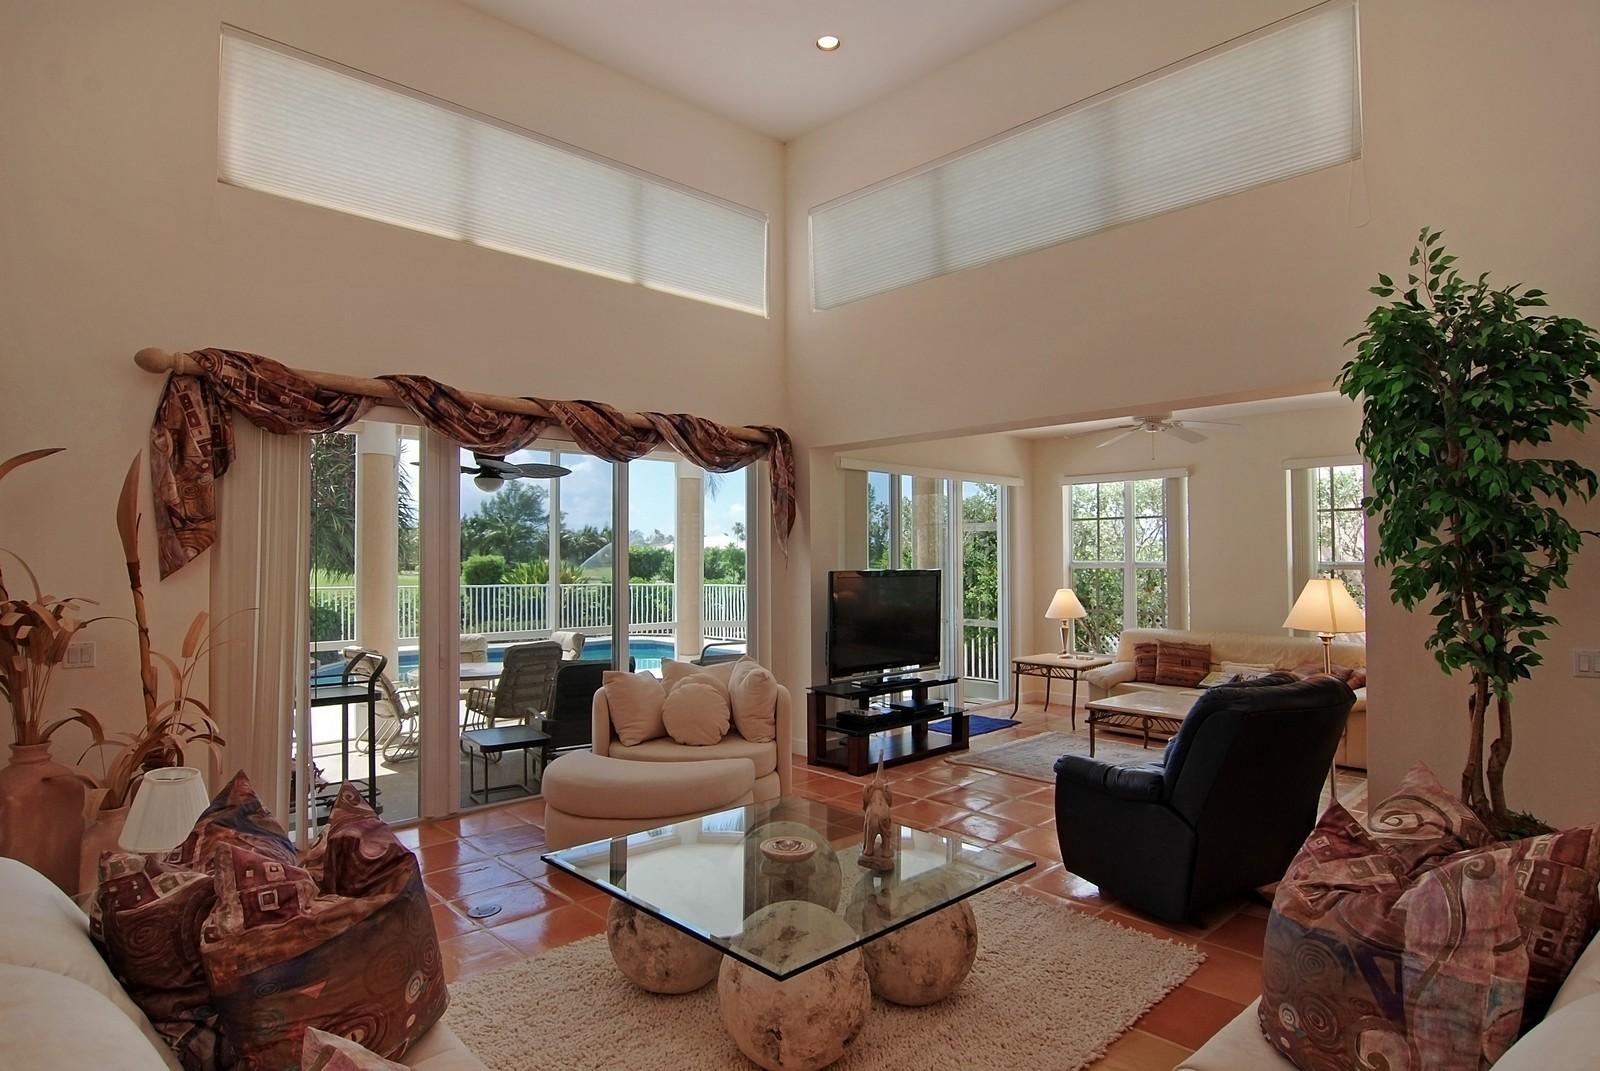 Real Estate Photography - 7000 SE Lakeview, Stuart, FL, 34996 - Living Room